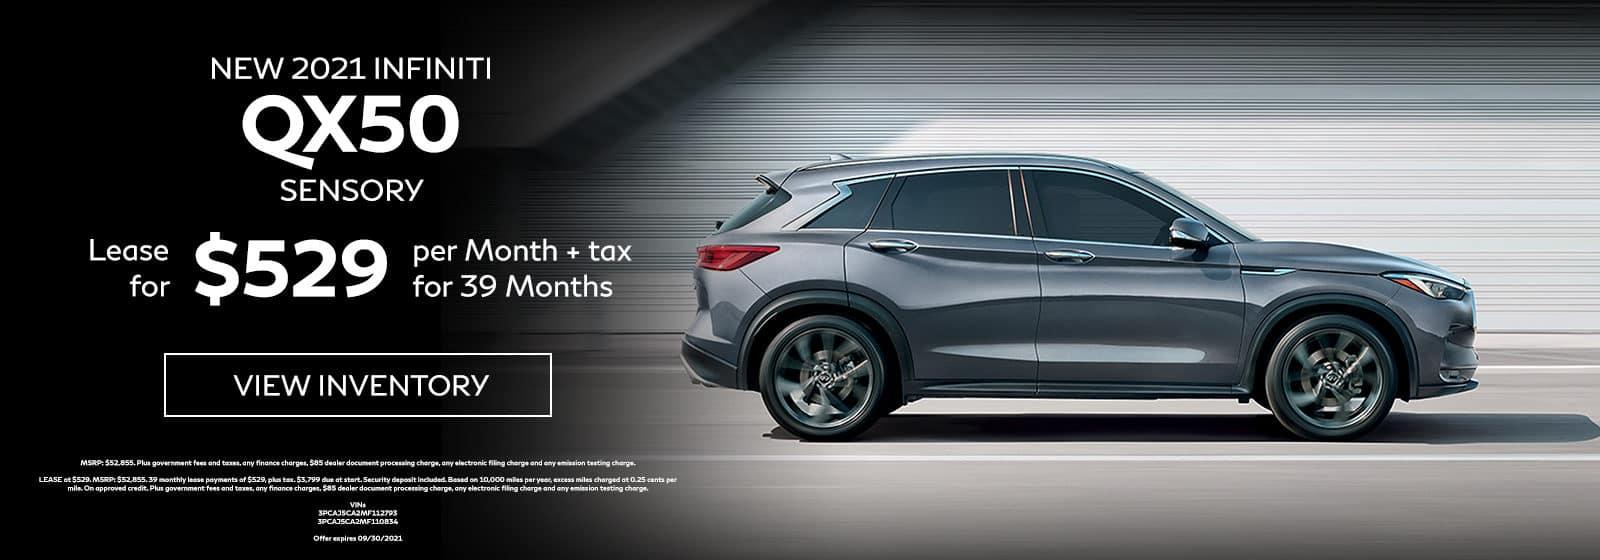 New 2021 INFINITI QX50 SENSORY Lease for $529 Per Month + Tax